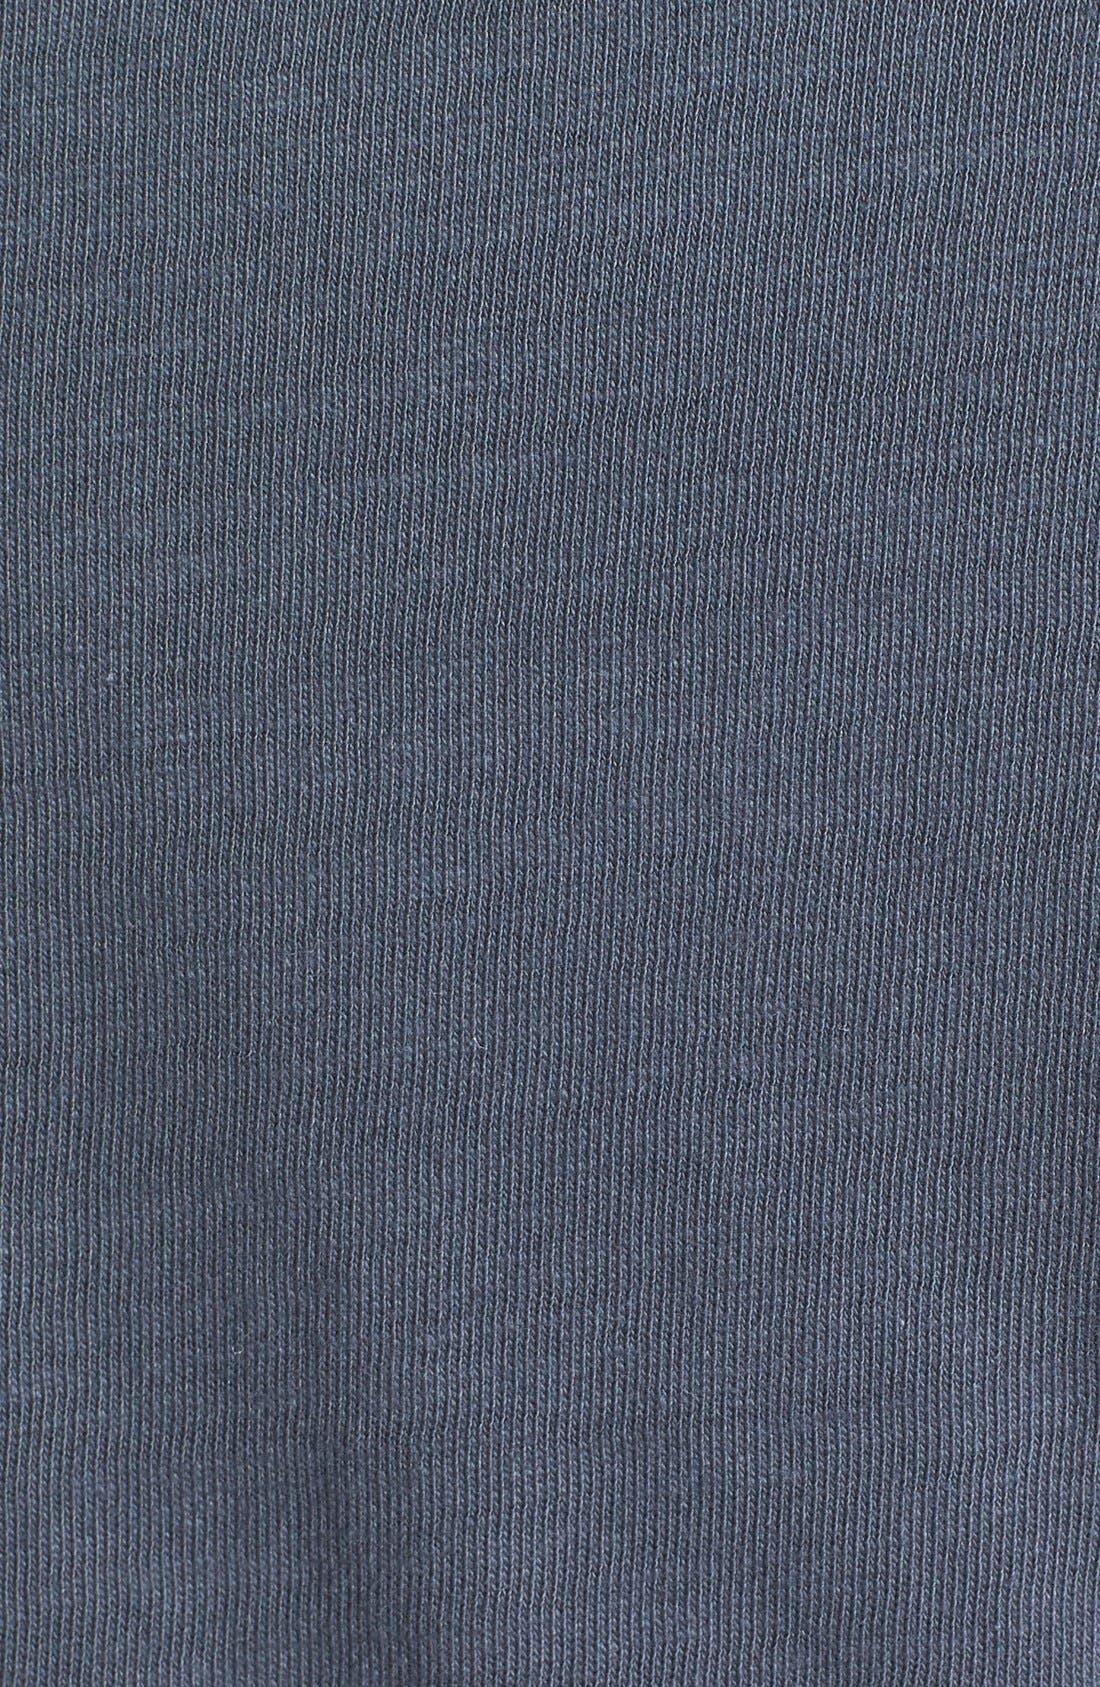 Knit One-Button Blazer,                             Alternate thumbnail 107, color,